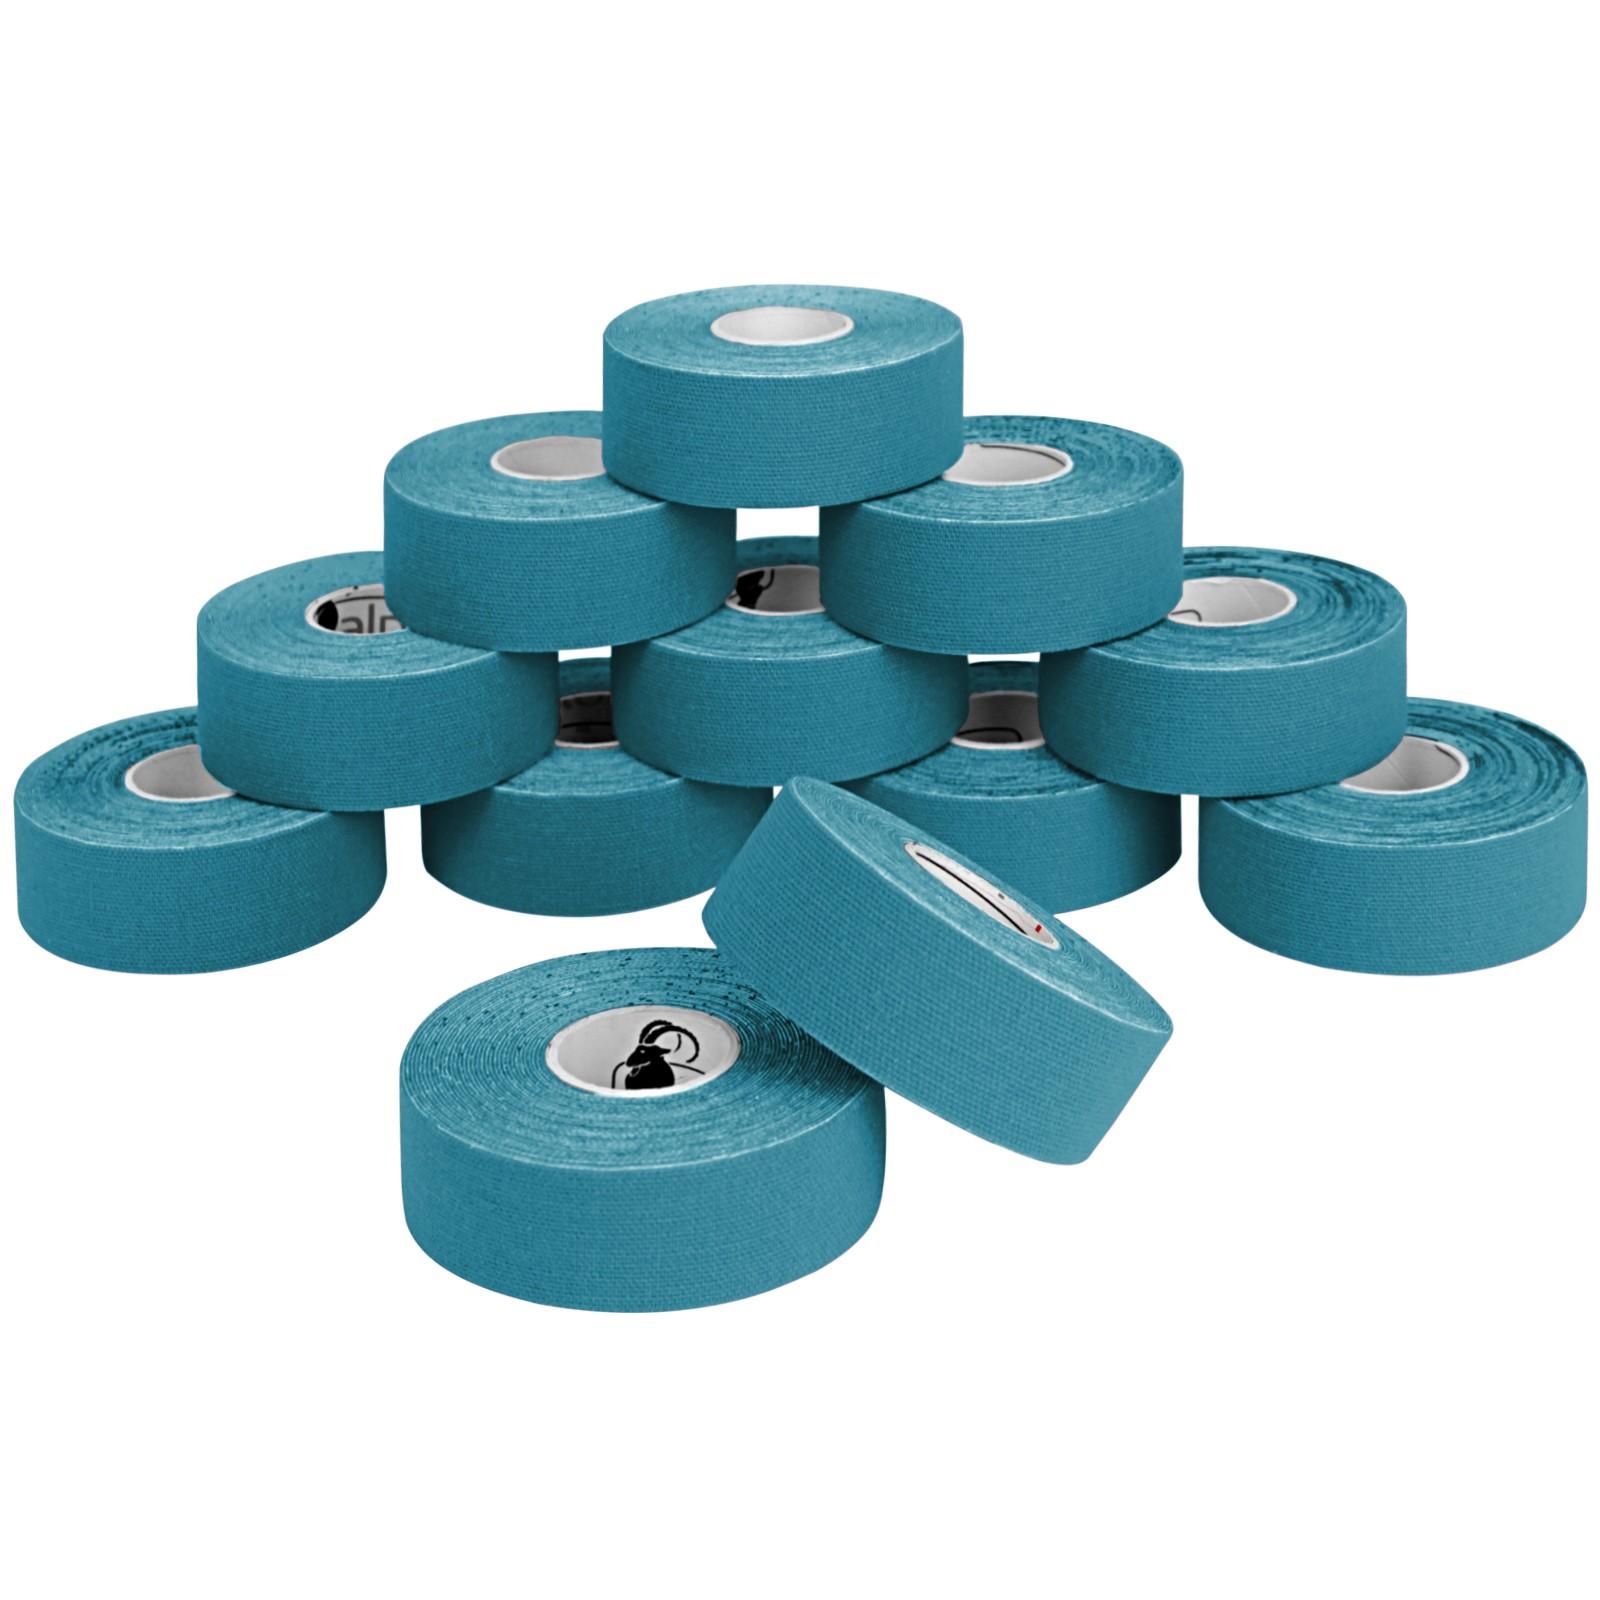 12 rollen kinesiologie tape 5 m x 2 5 cm in 5 farben von bb sport fitness kinesio tape. Black Bedroom Furniture Sets. Home Design Ideas